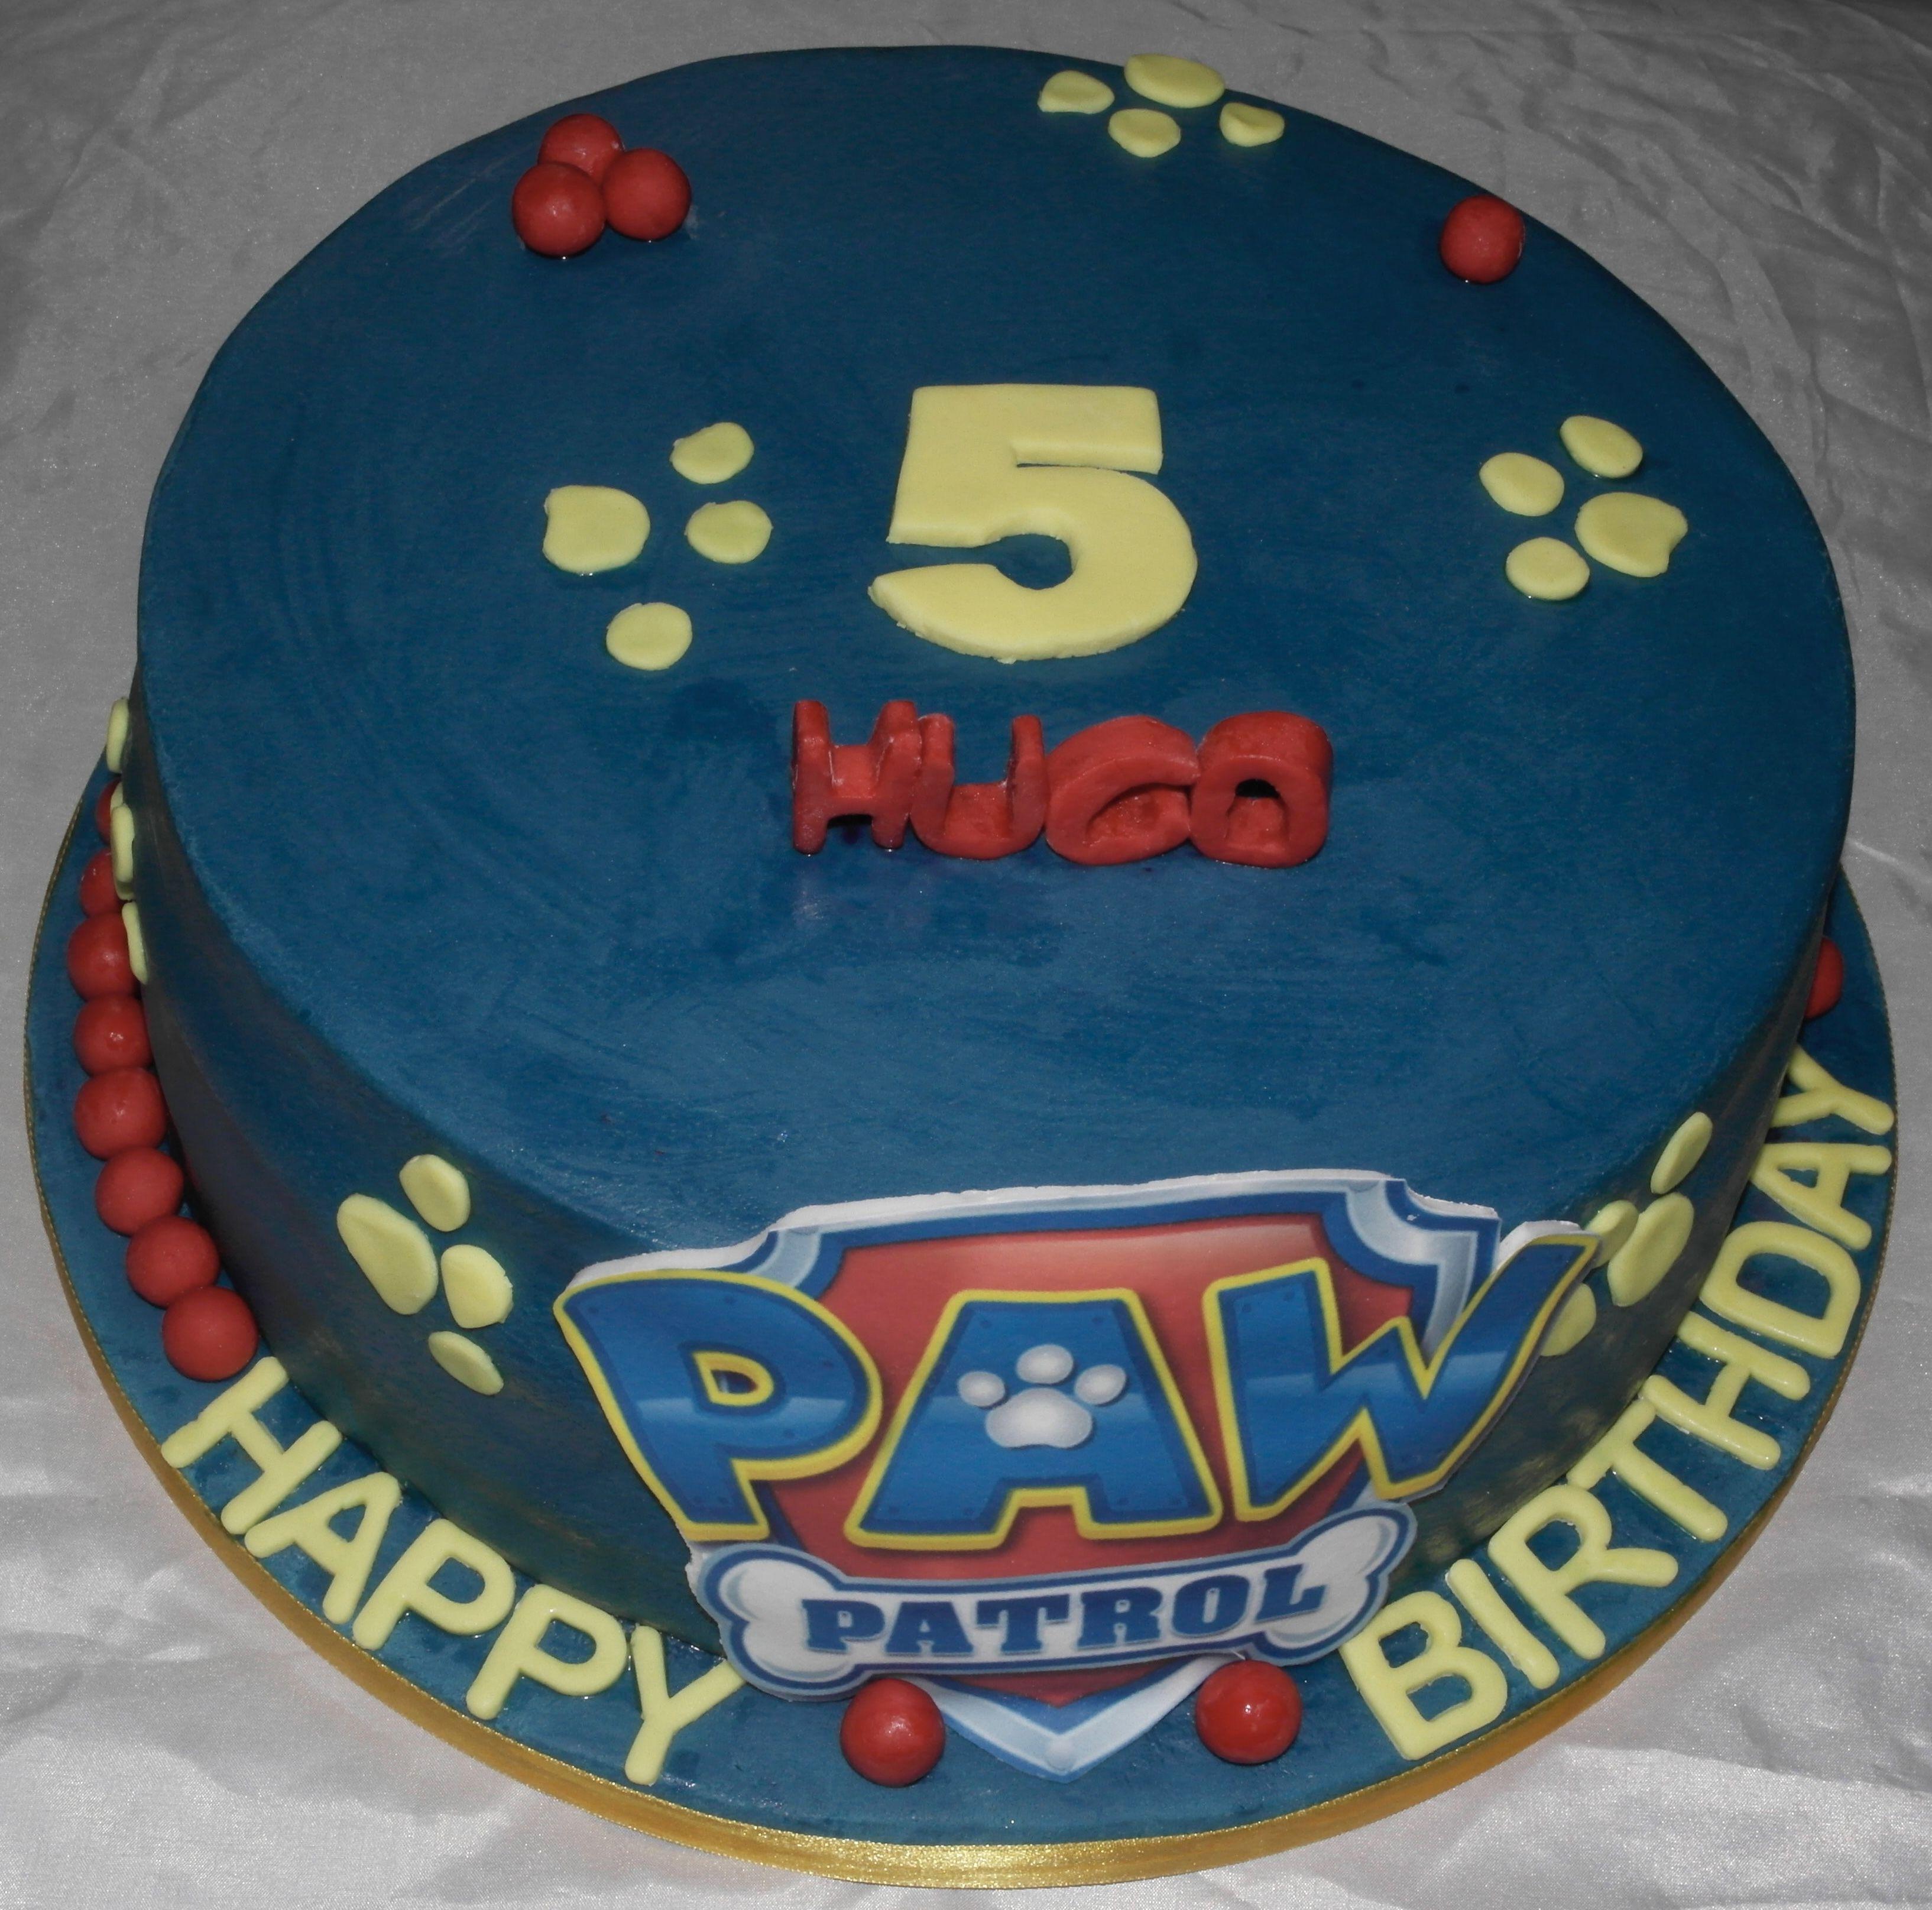 Tremendous Paw Patrol 5Th Birthday Cake Chocolate Layered Cake With Paw Funny Birthday Cards Online Bapapcheapnameinfo